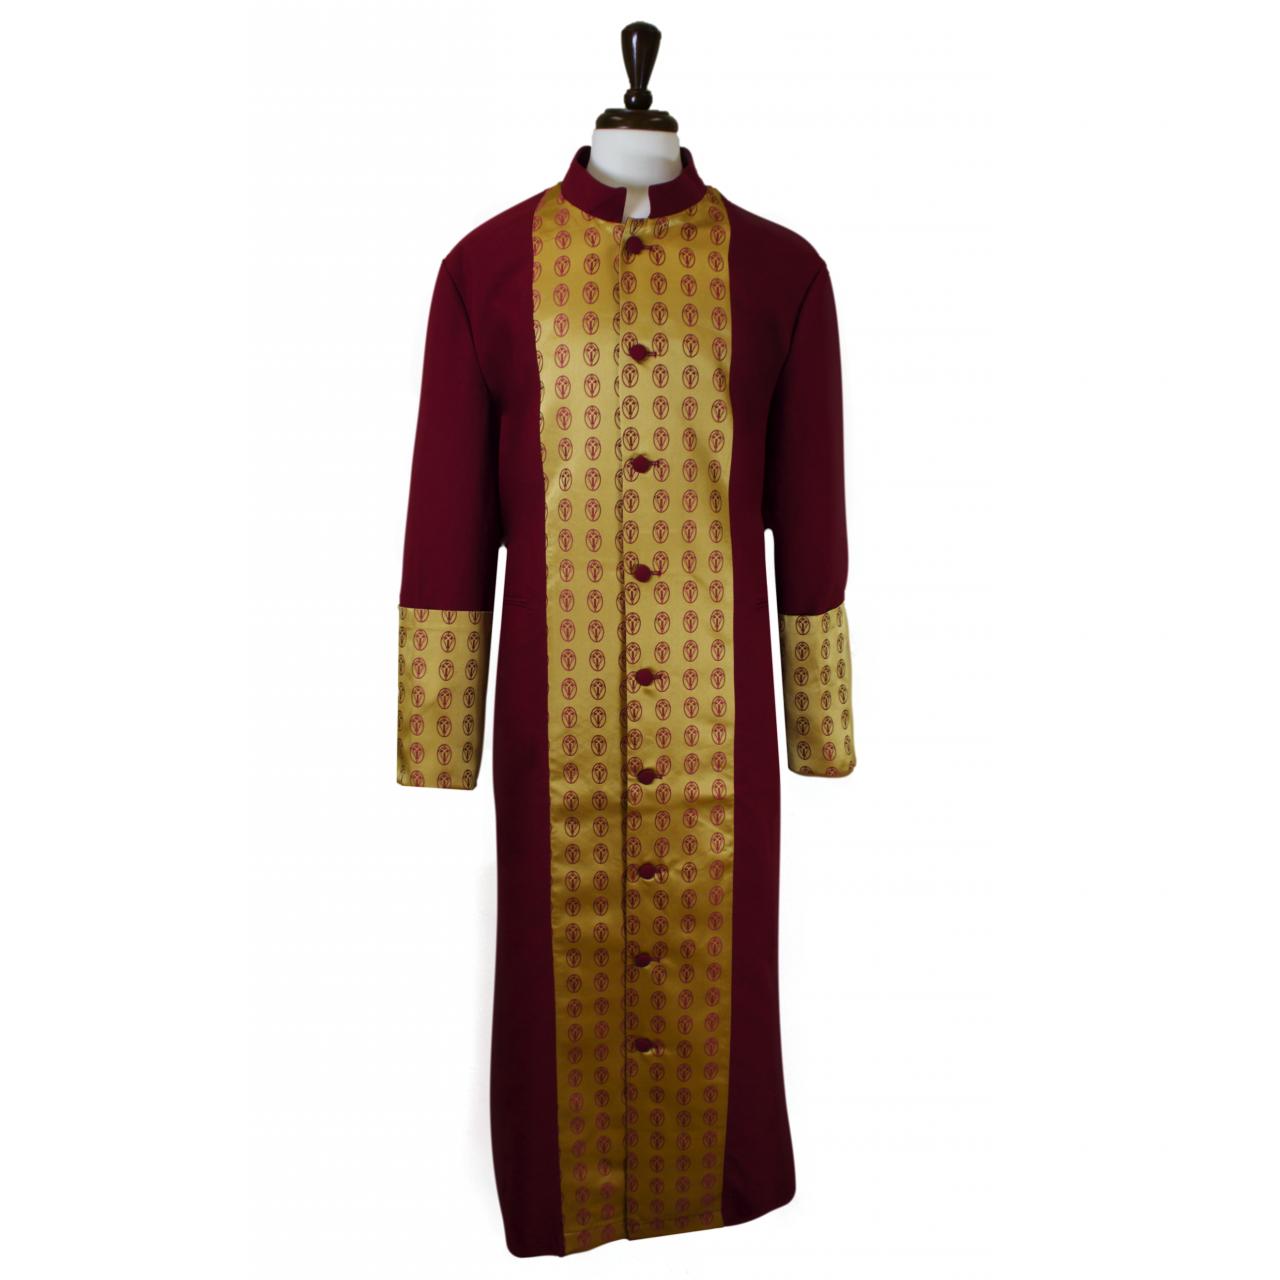 808 M. Men's Premium Pastor/Clergy Robe - Burgundy/Gold Brocade